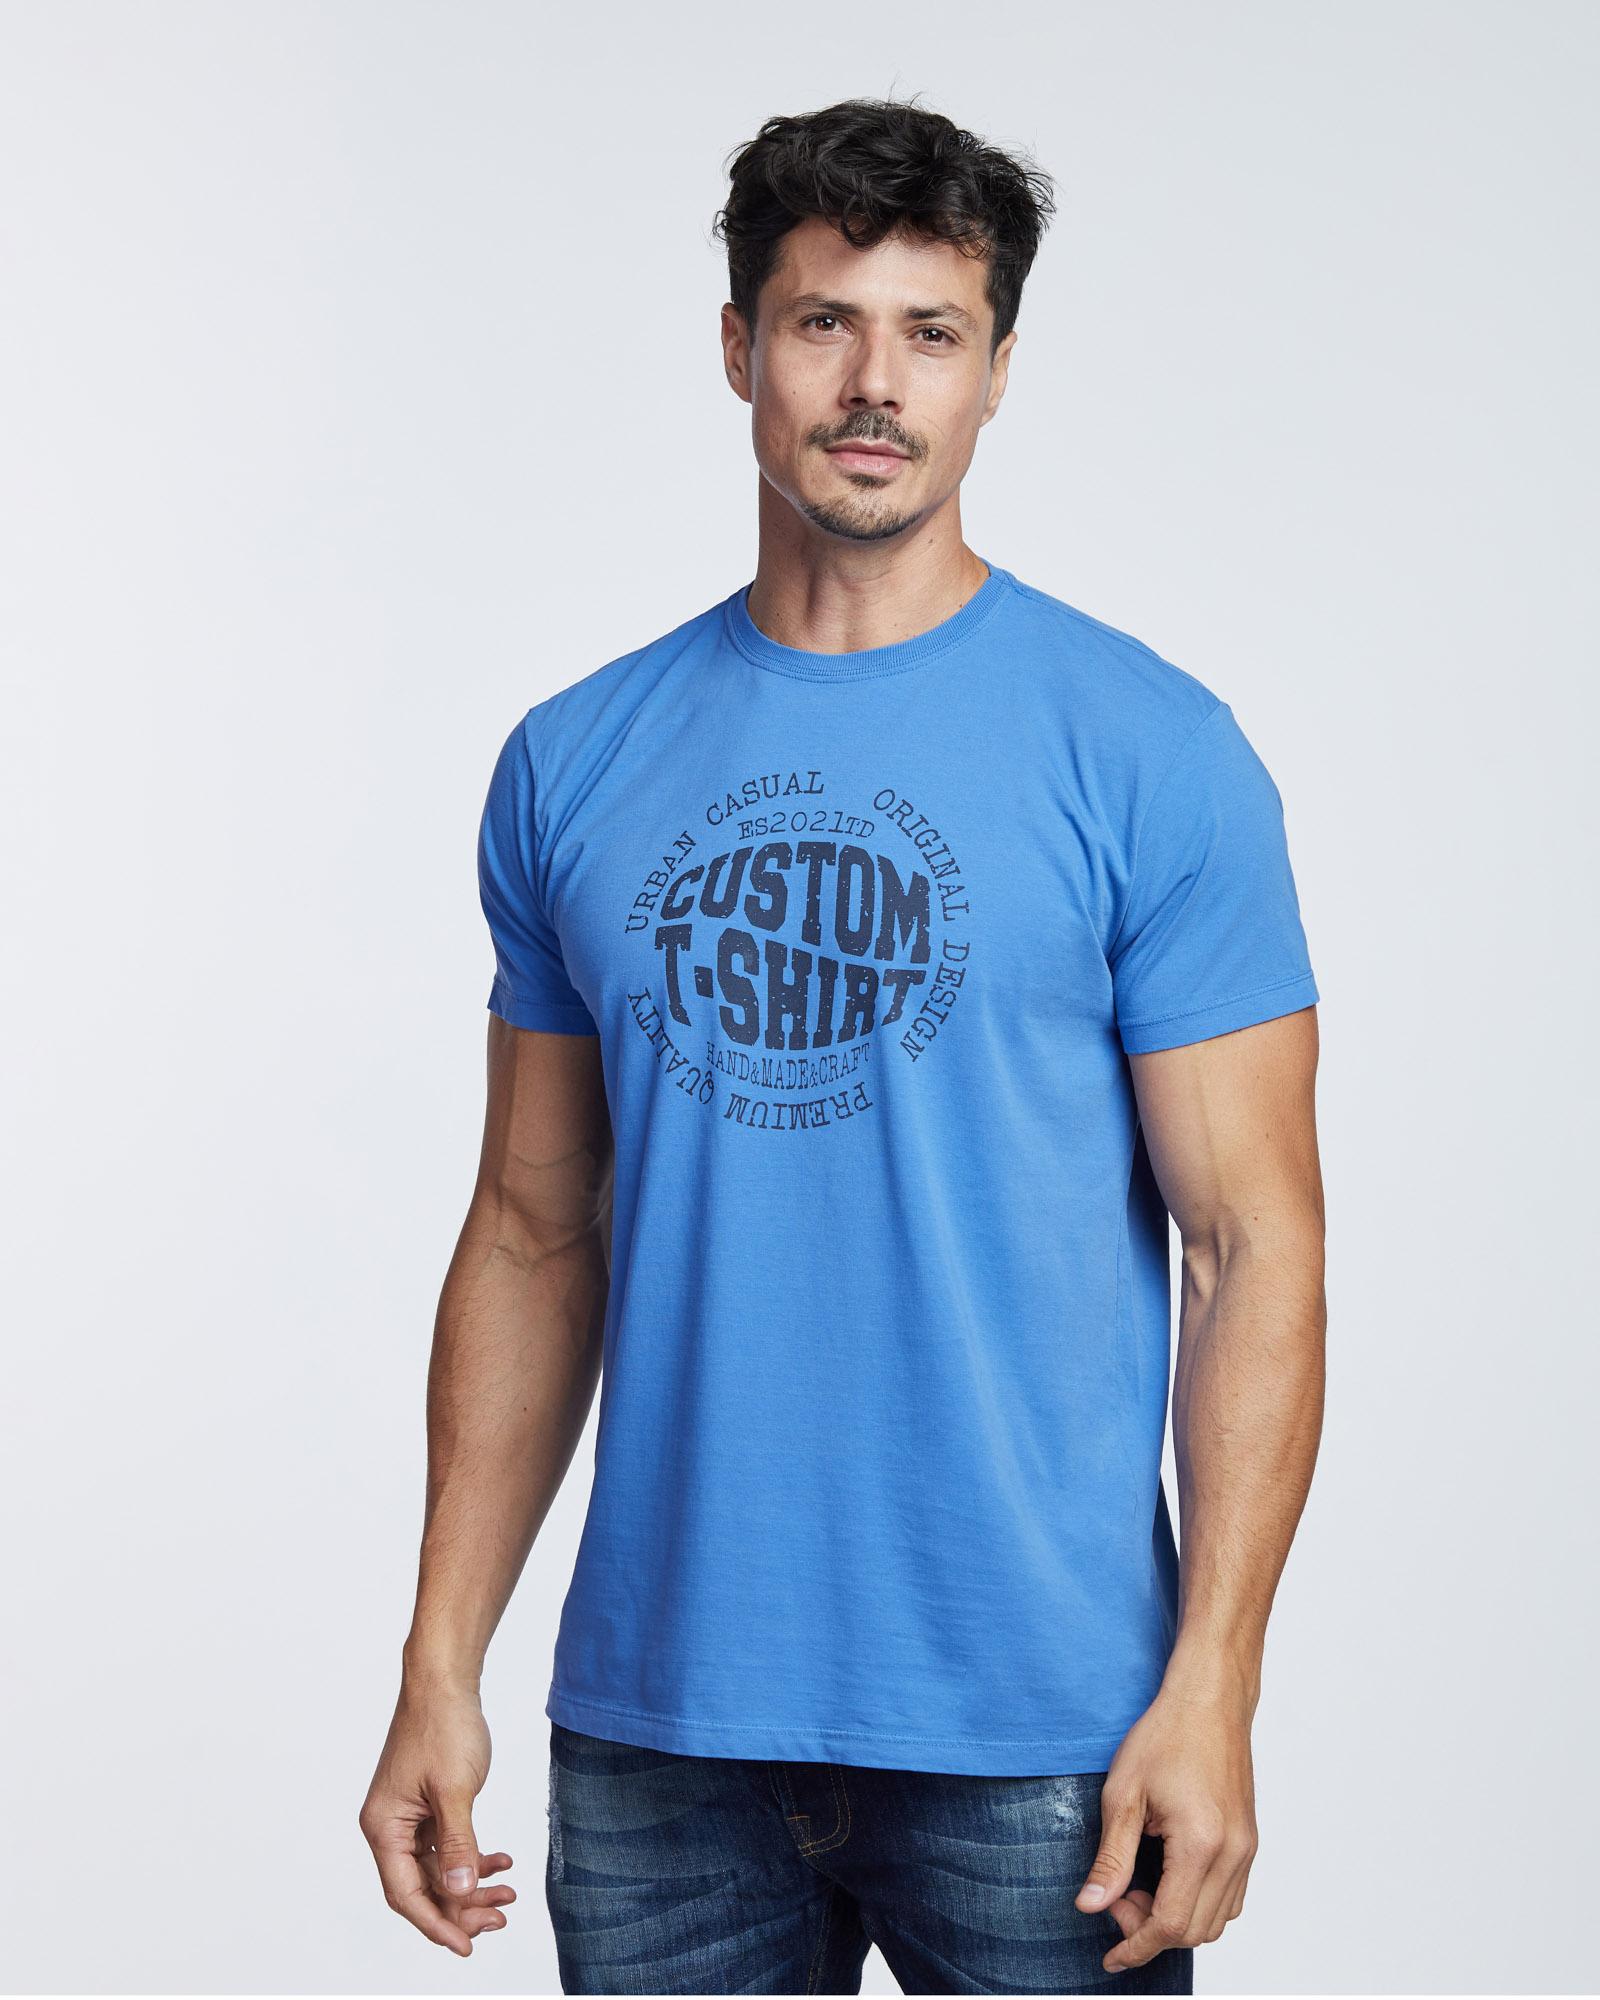 Camiseta Custom Design Masculina Evolvee